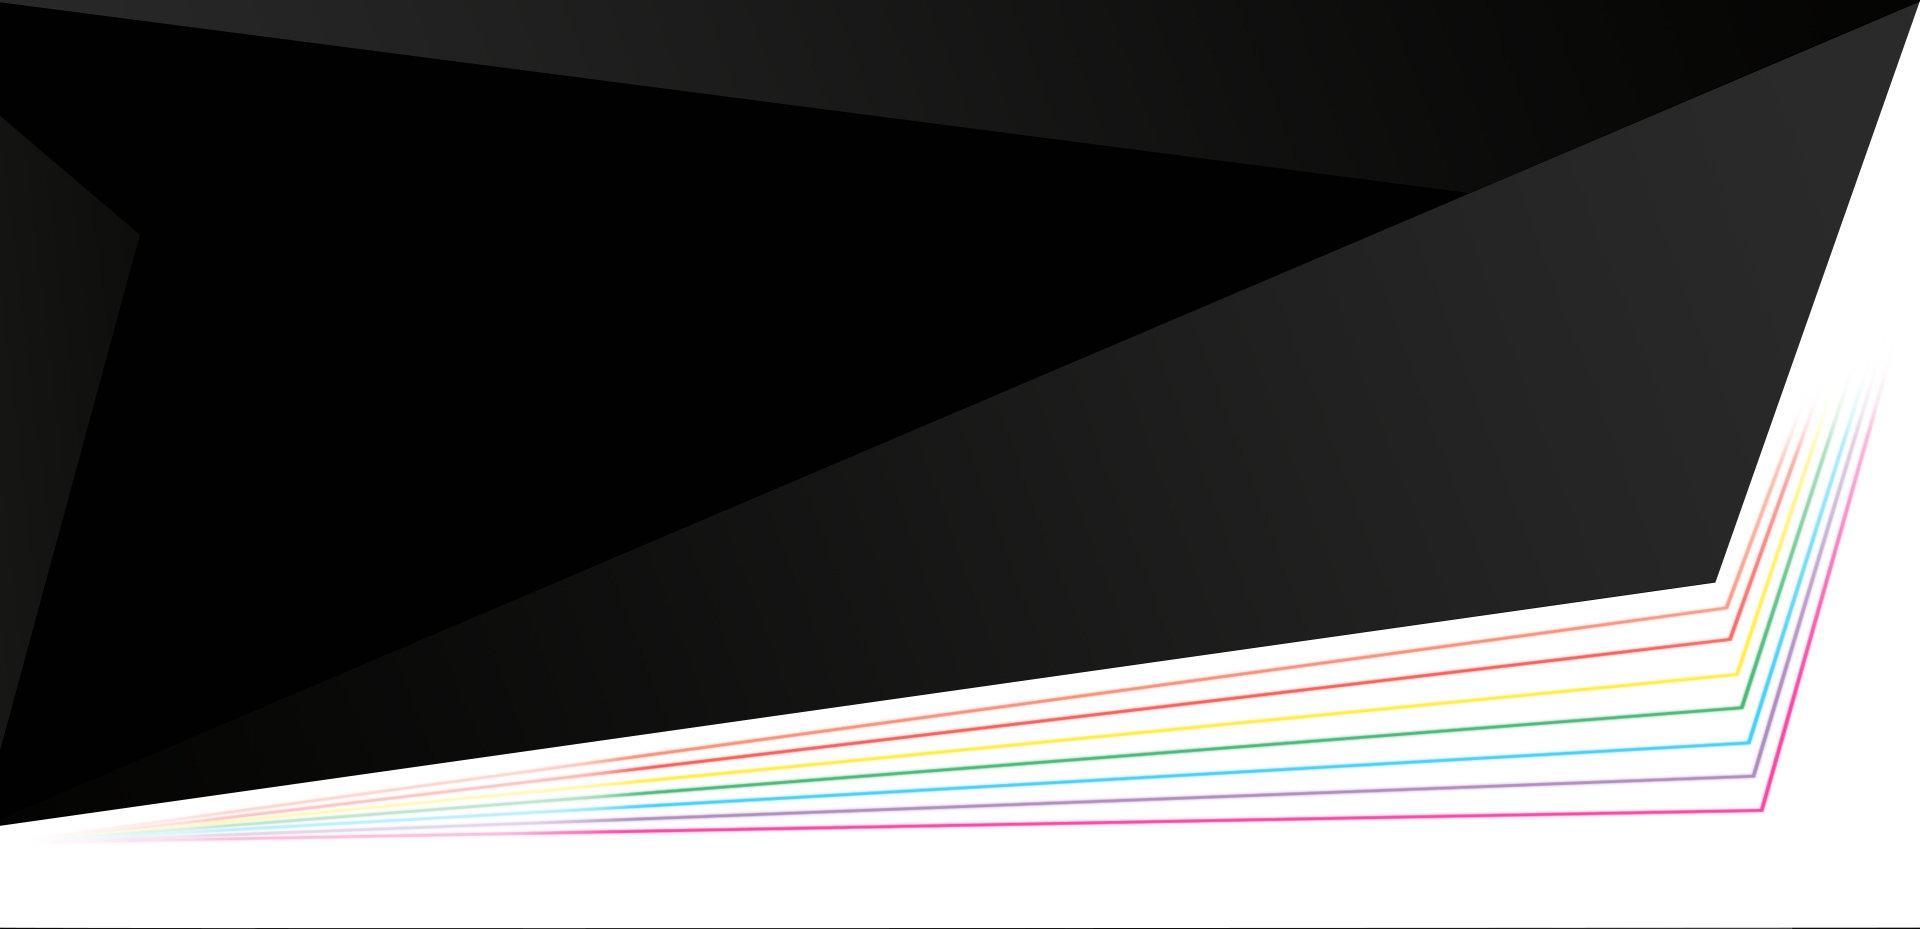 <strong>重</strong>-塑光<br>2017国际消费电子展&#174;欧司朗展台